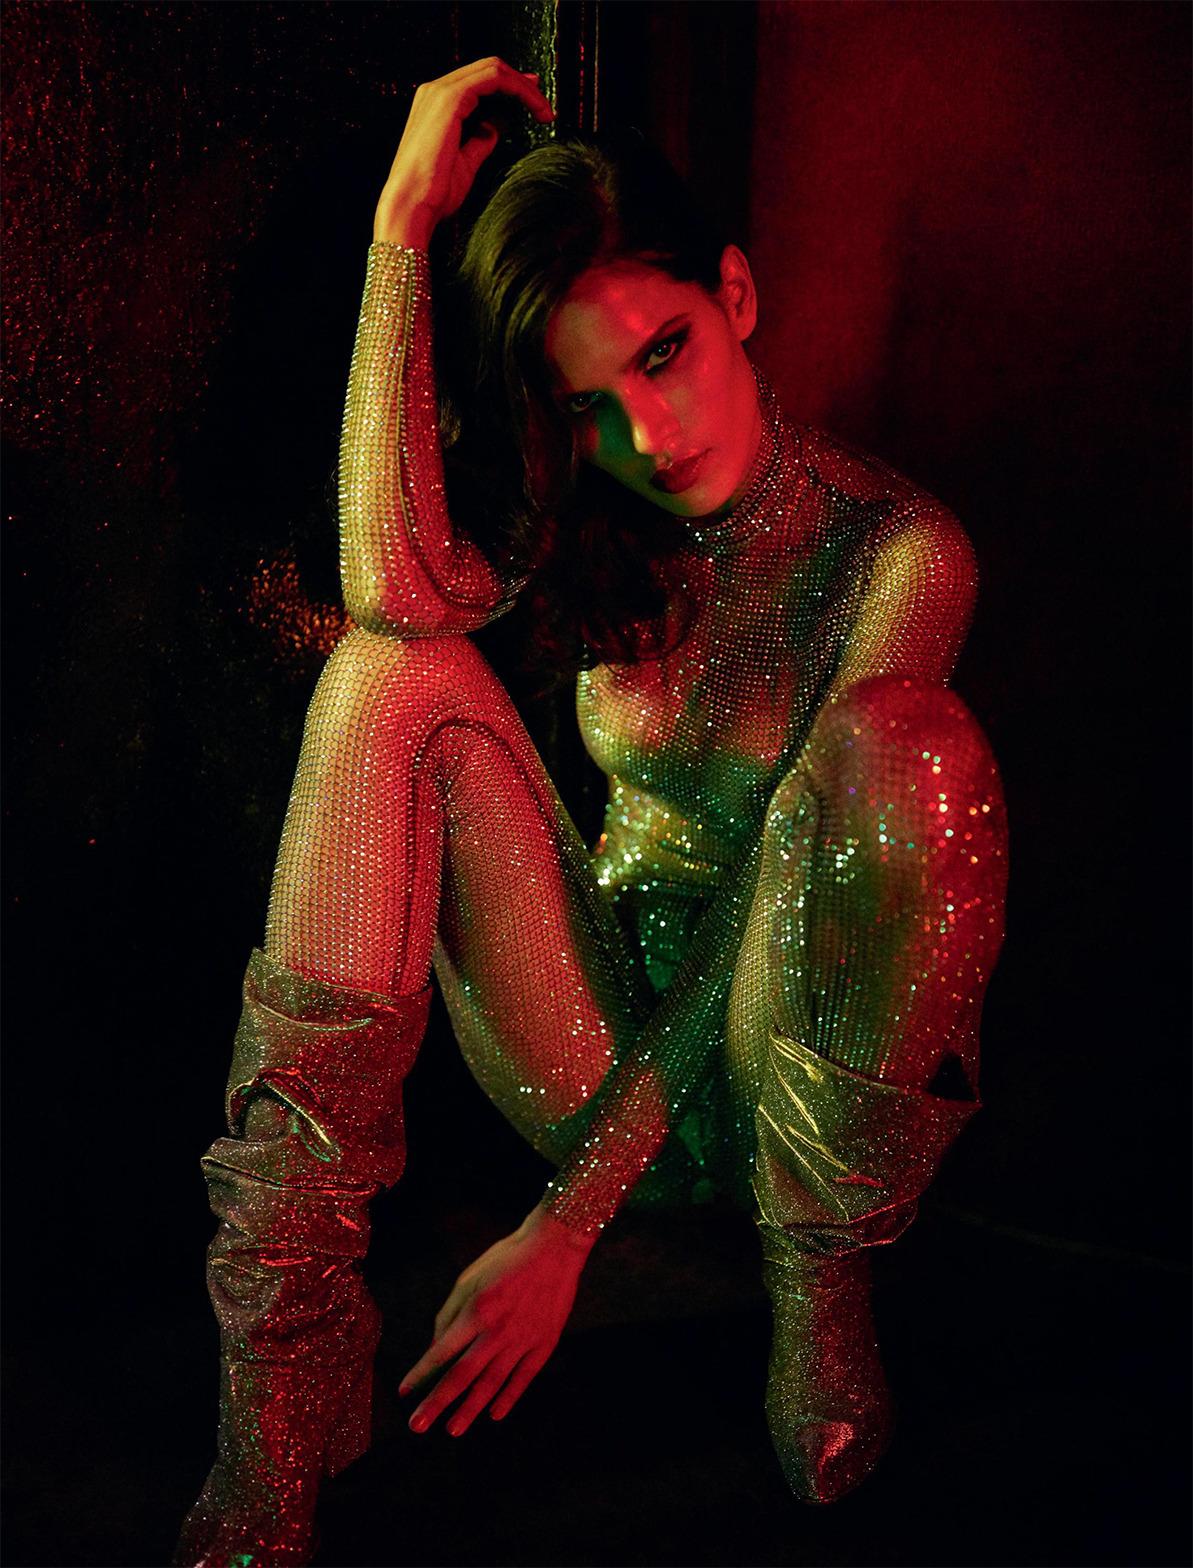 Raica Oliveira by Gaspar Noe for Lui Magazine